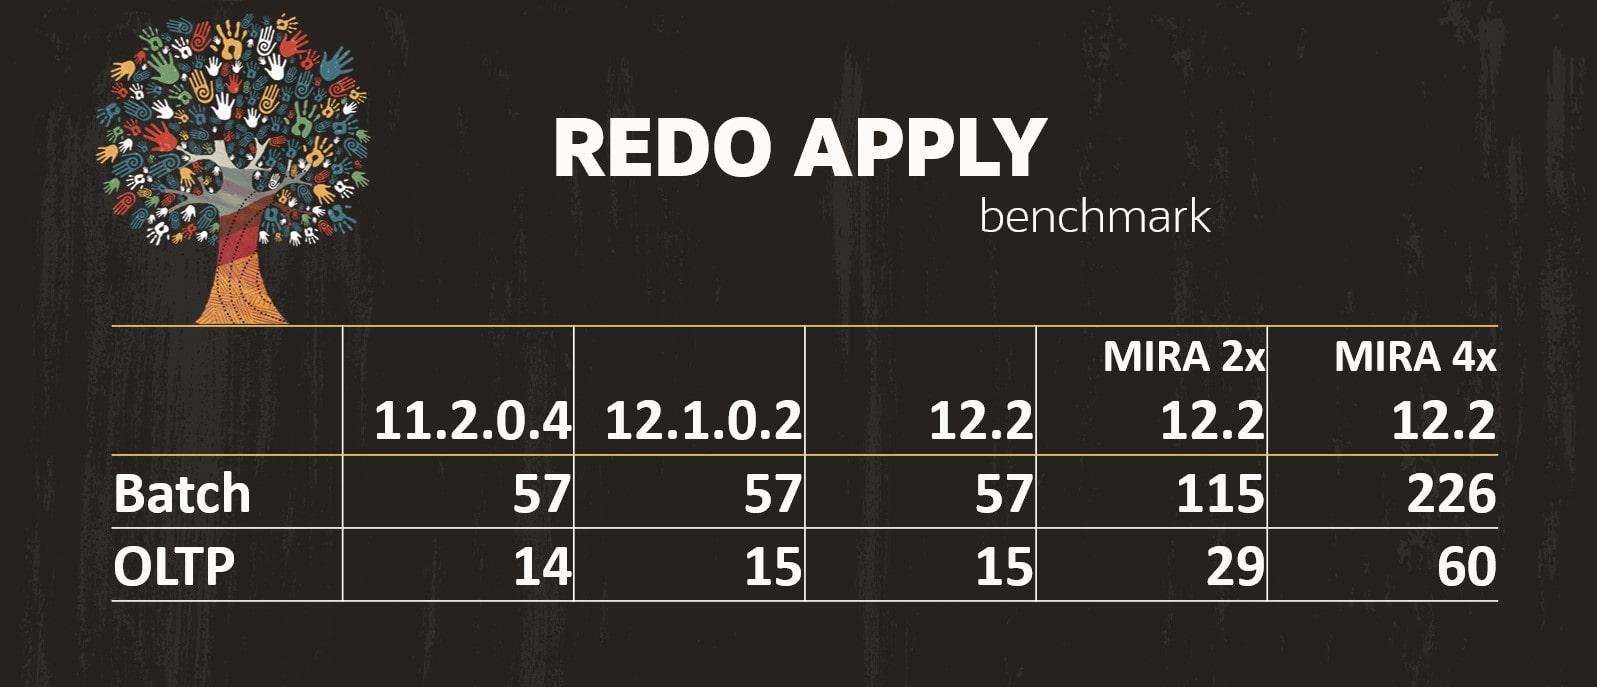 Redo Apply benchmark of Oracle Database Data Guard